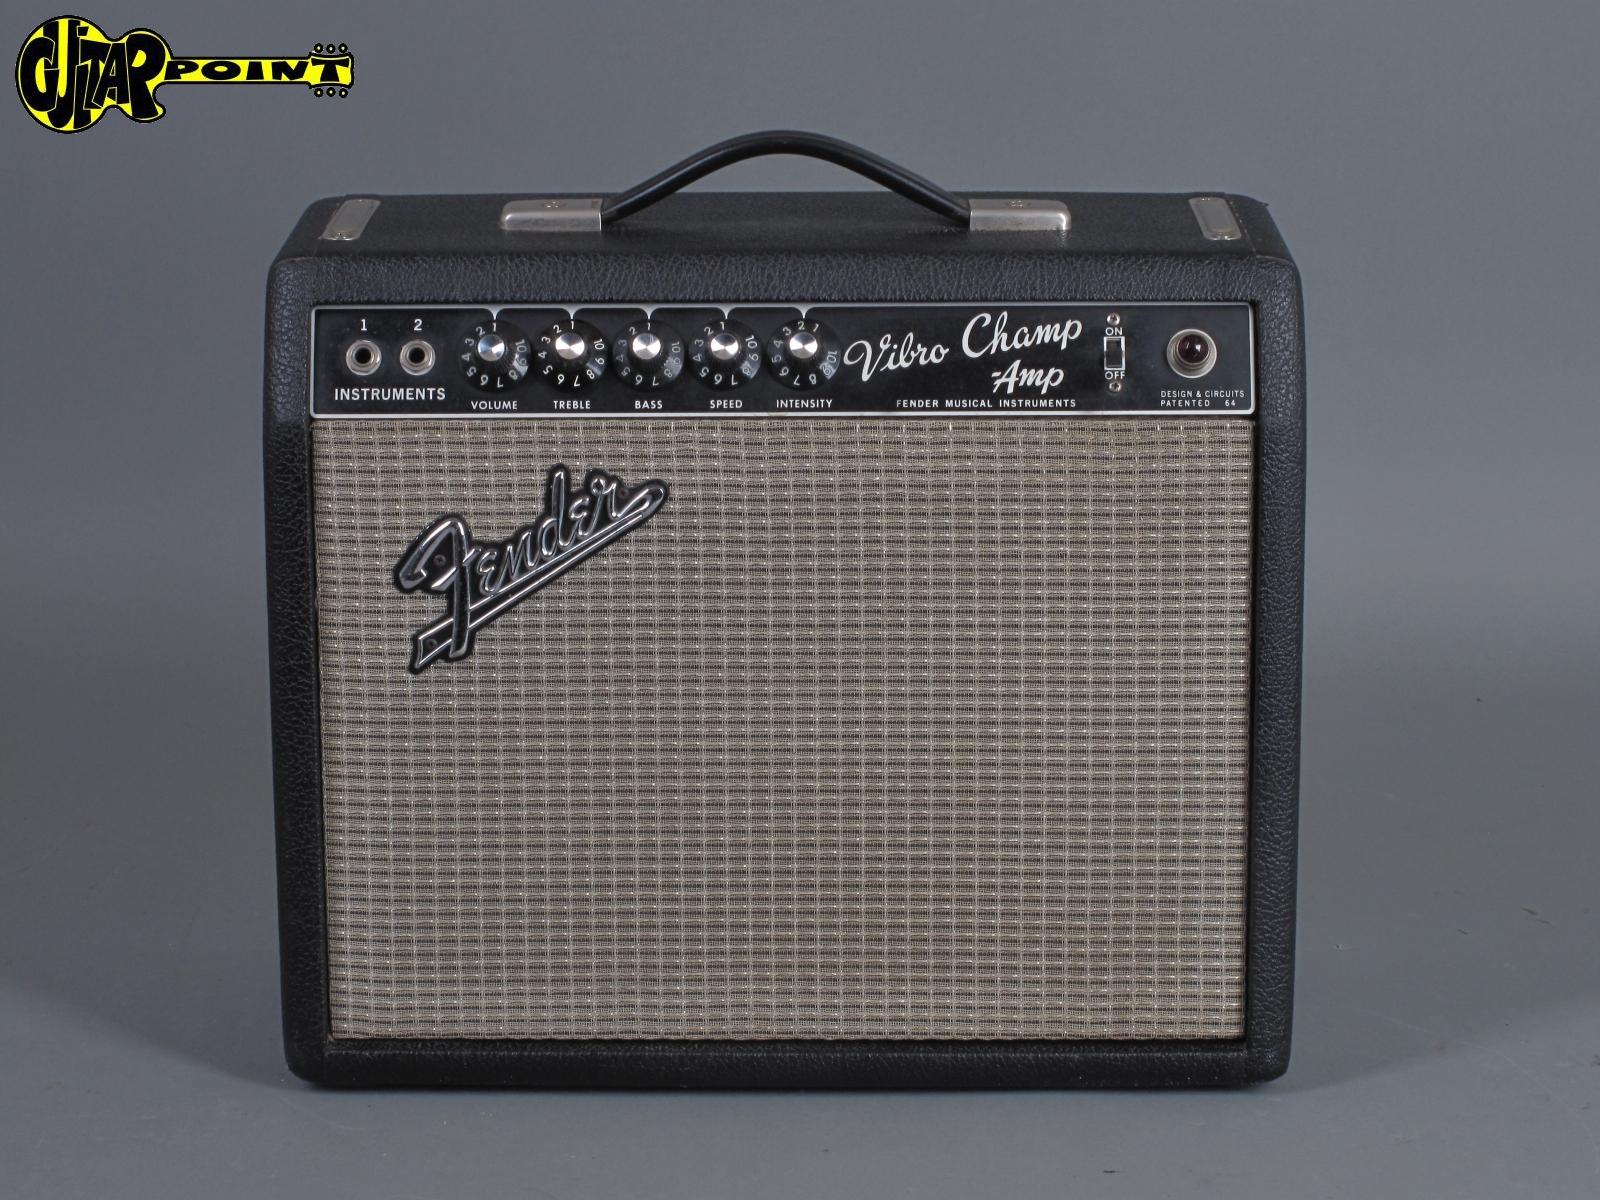 1967 Fender Vibro Champ Amp - Blackface    ...Mint !!